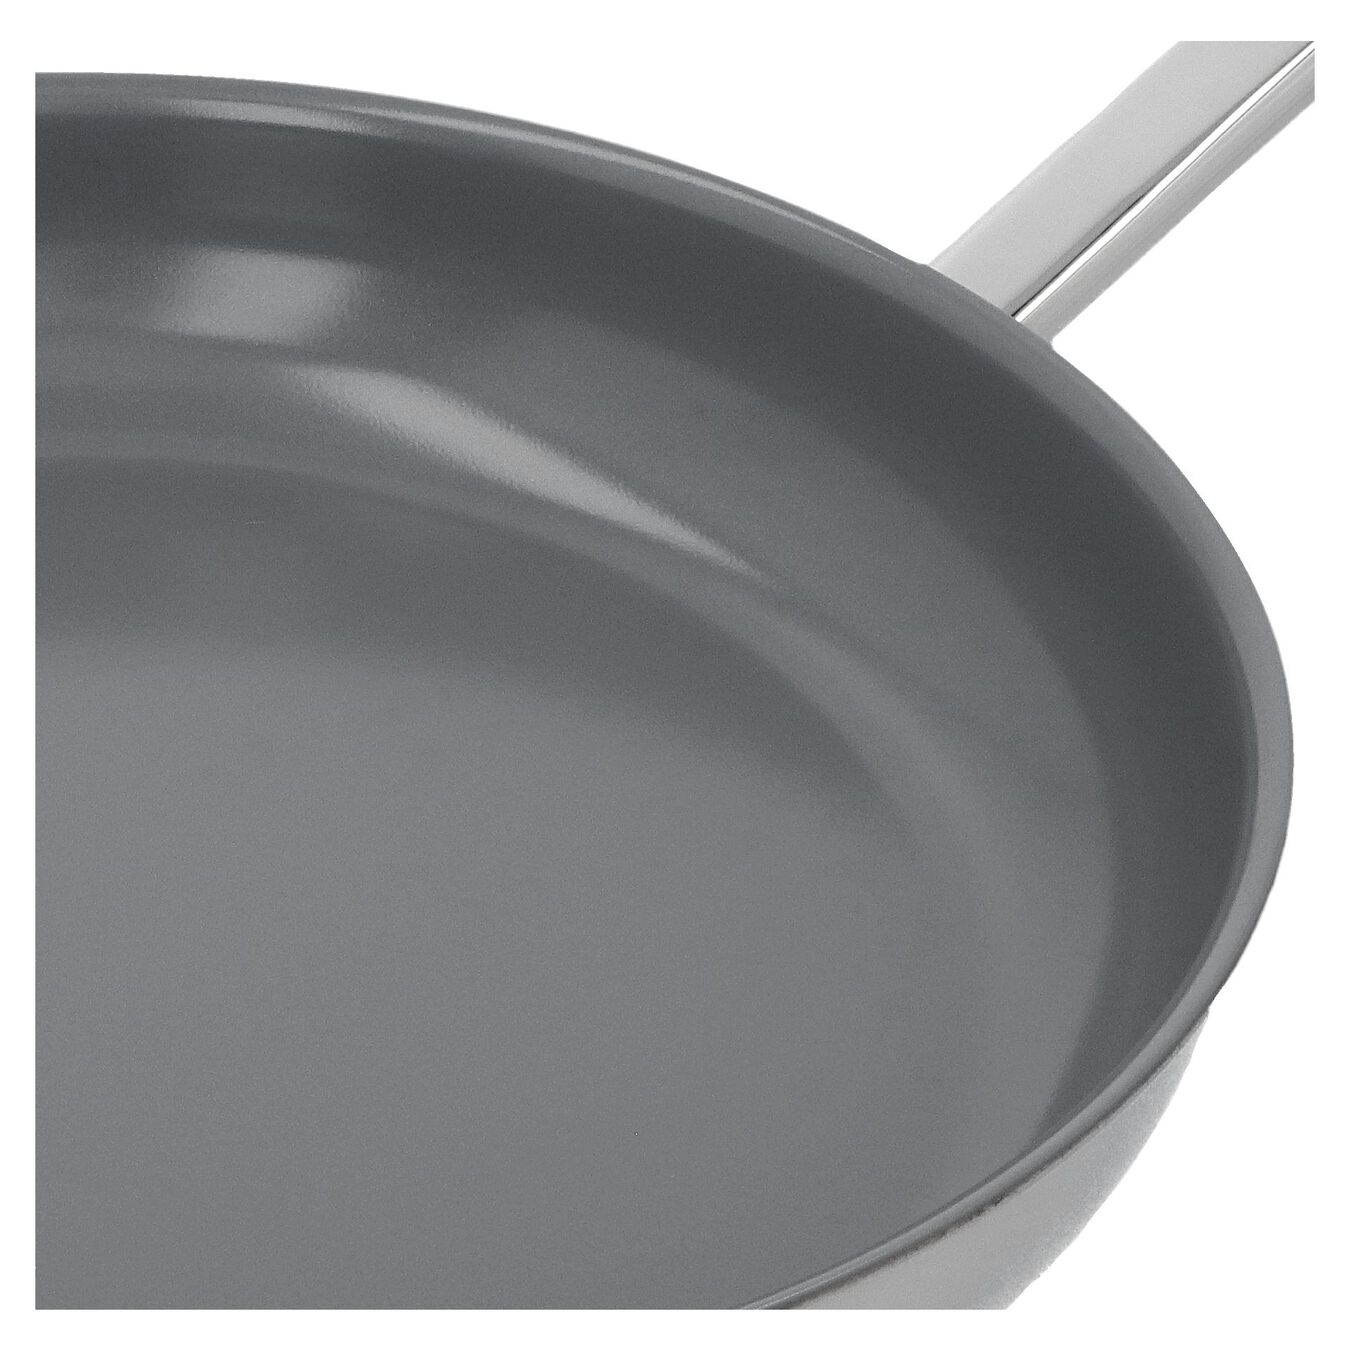 Stekpanna 32 cm, 18/10 Rostfritt stål, Silver,,large 5